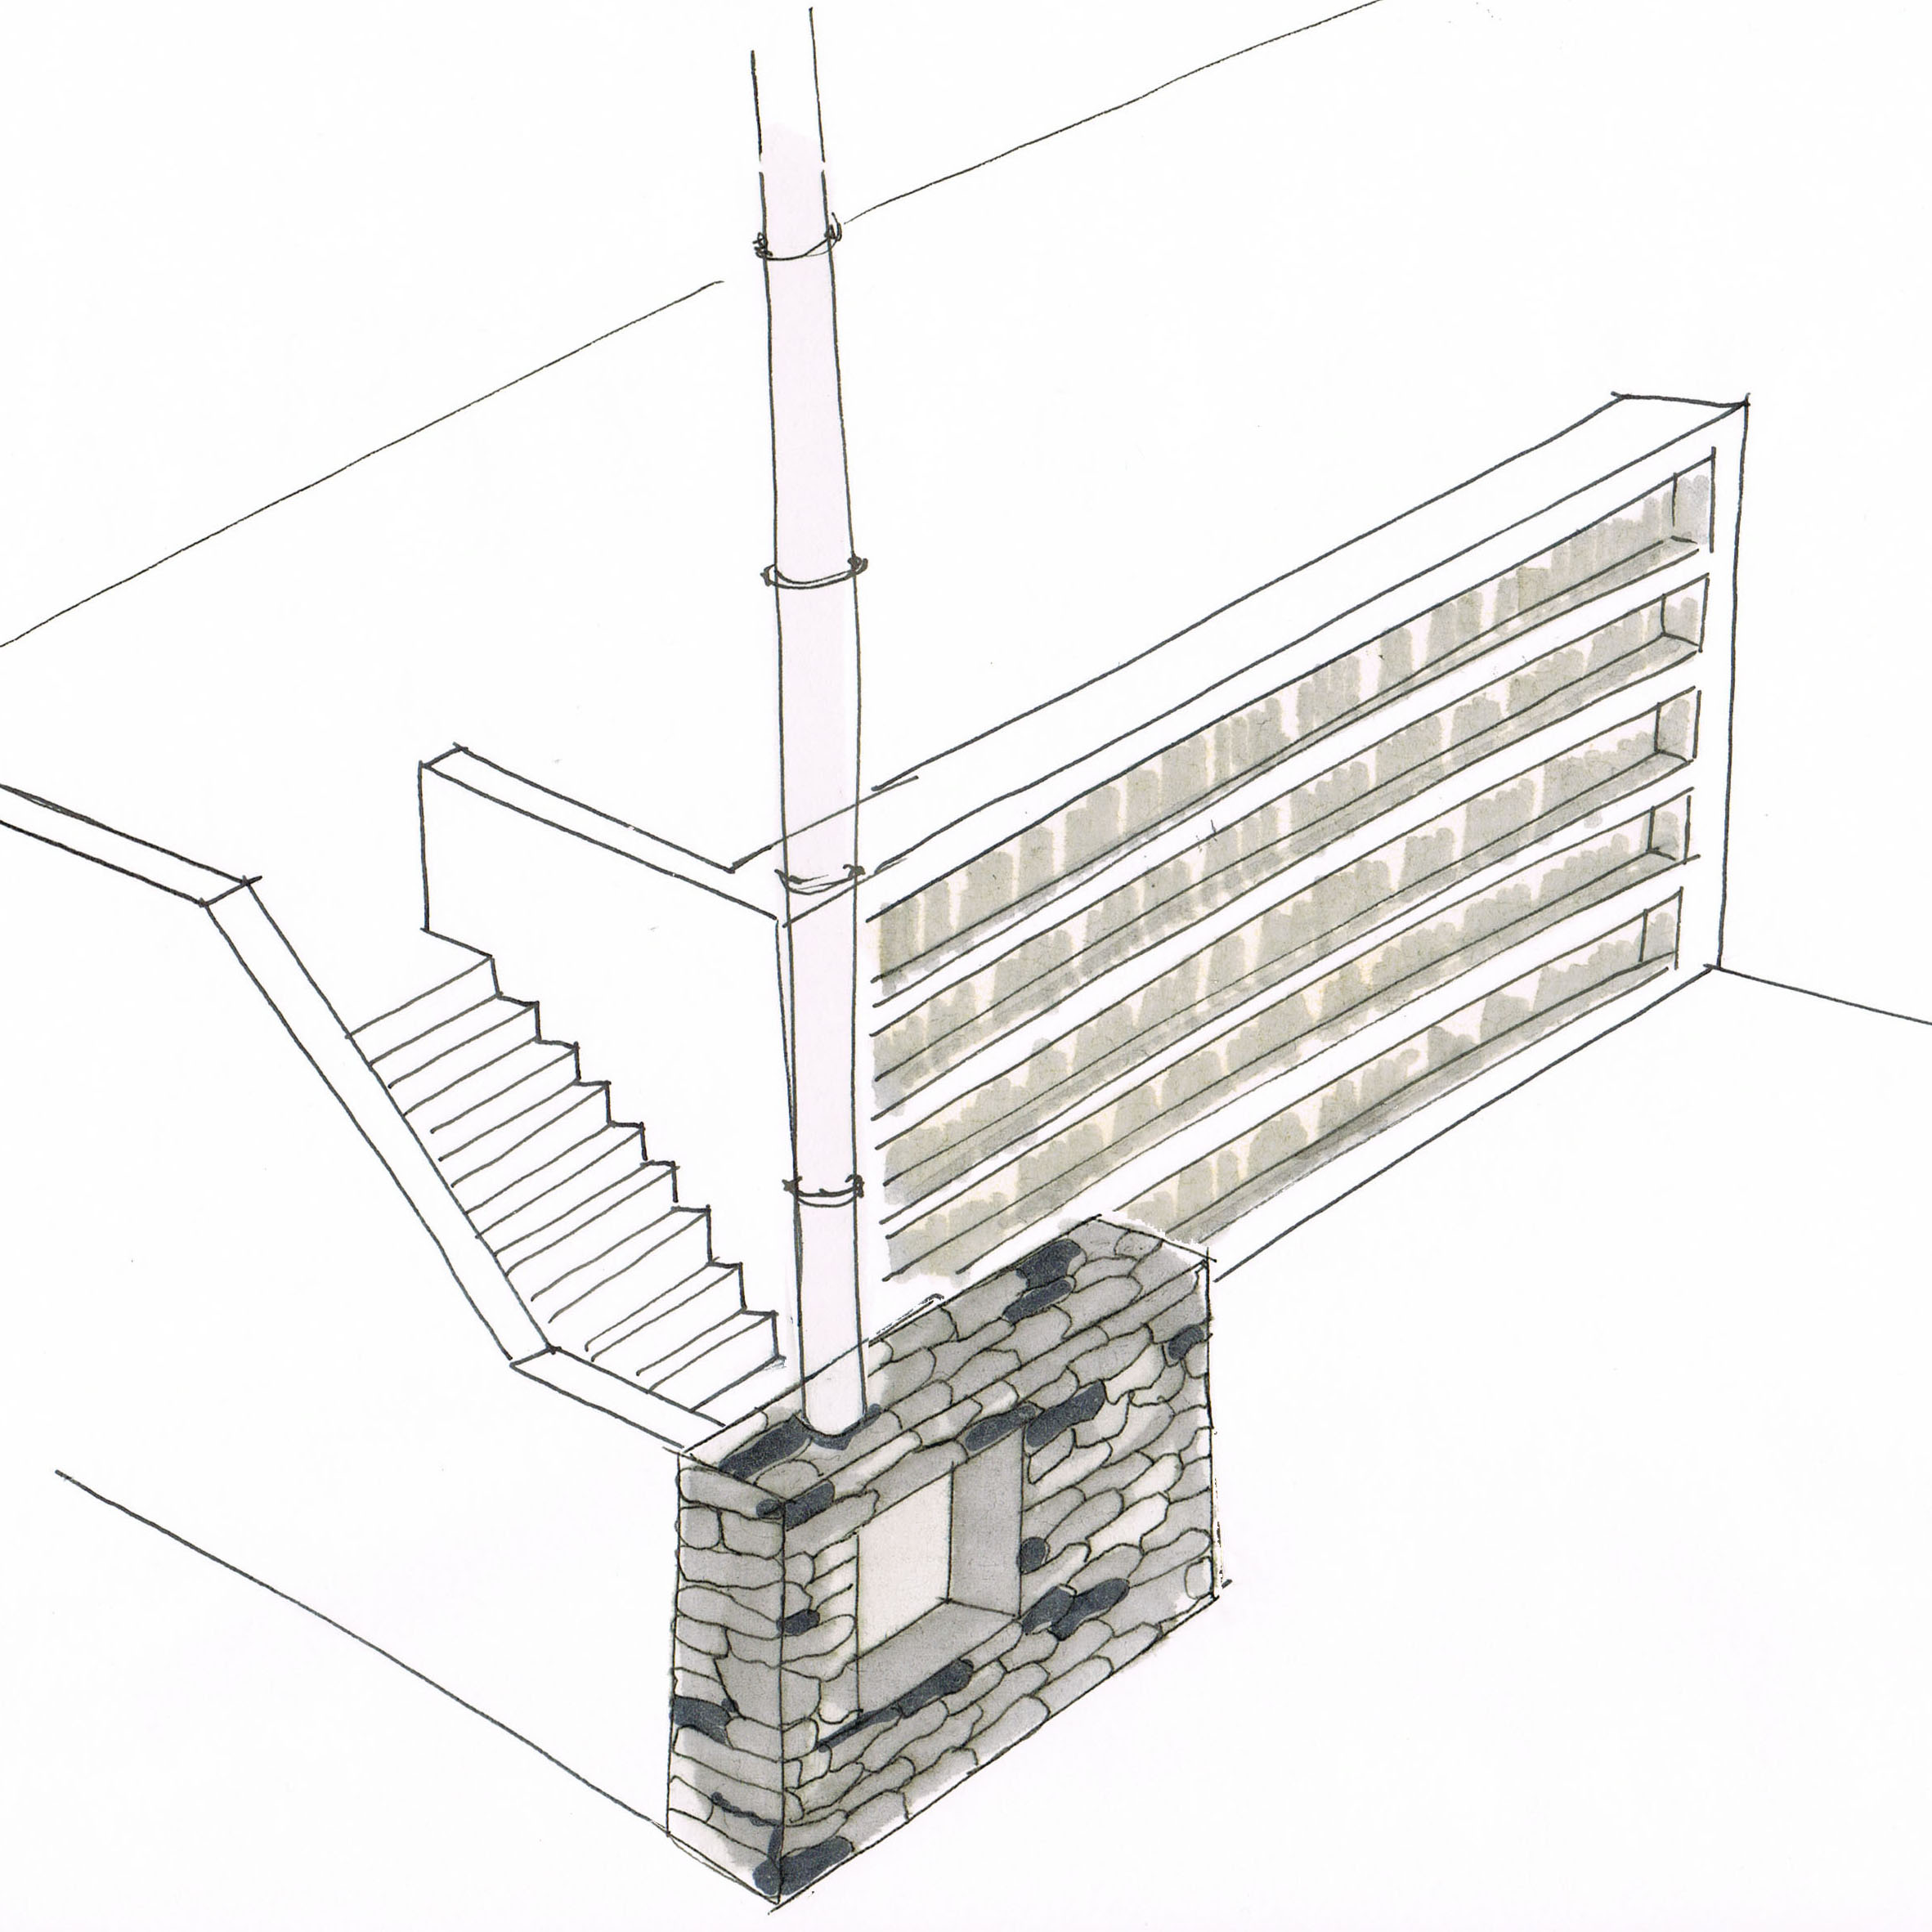 stoel_architect_kampen_stoelaantafel (1)